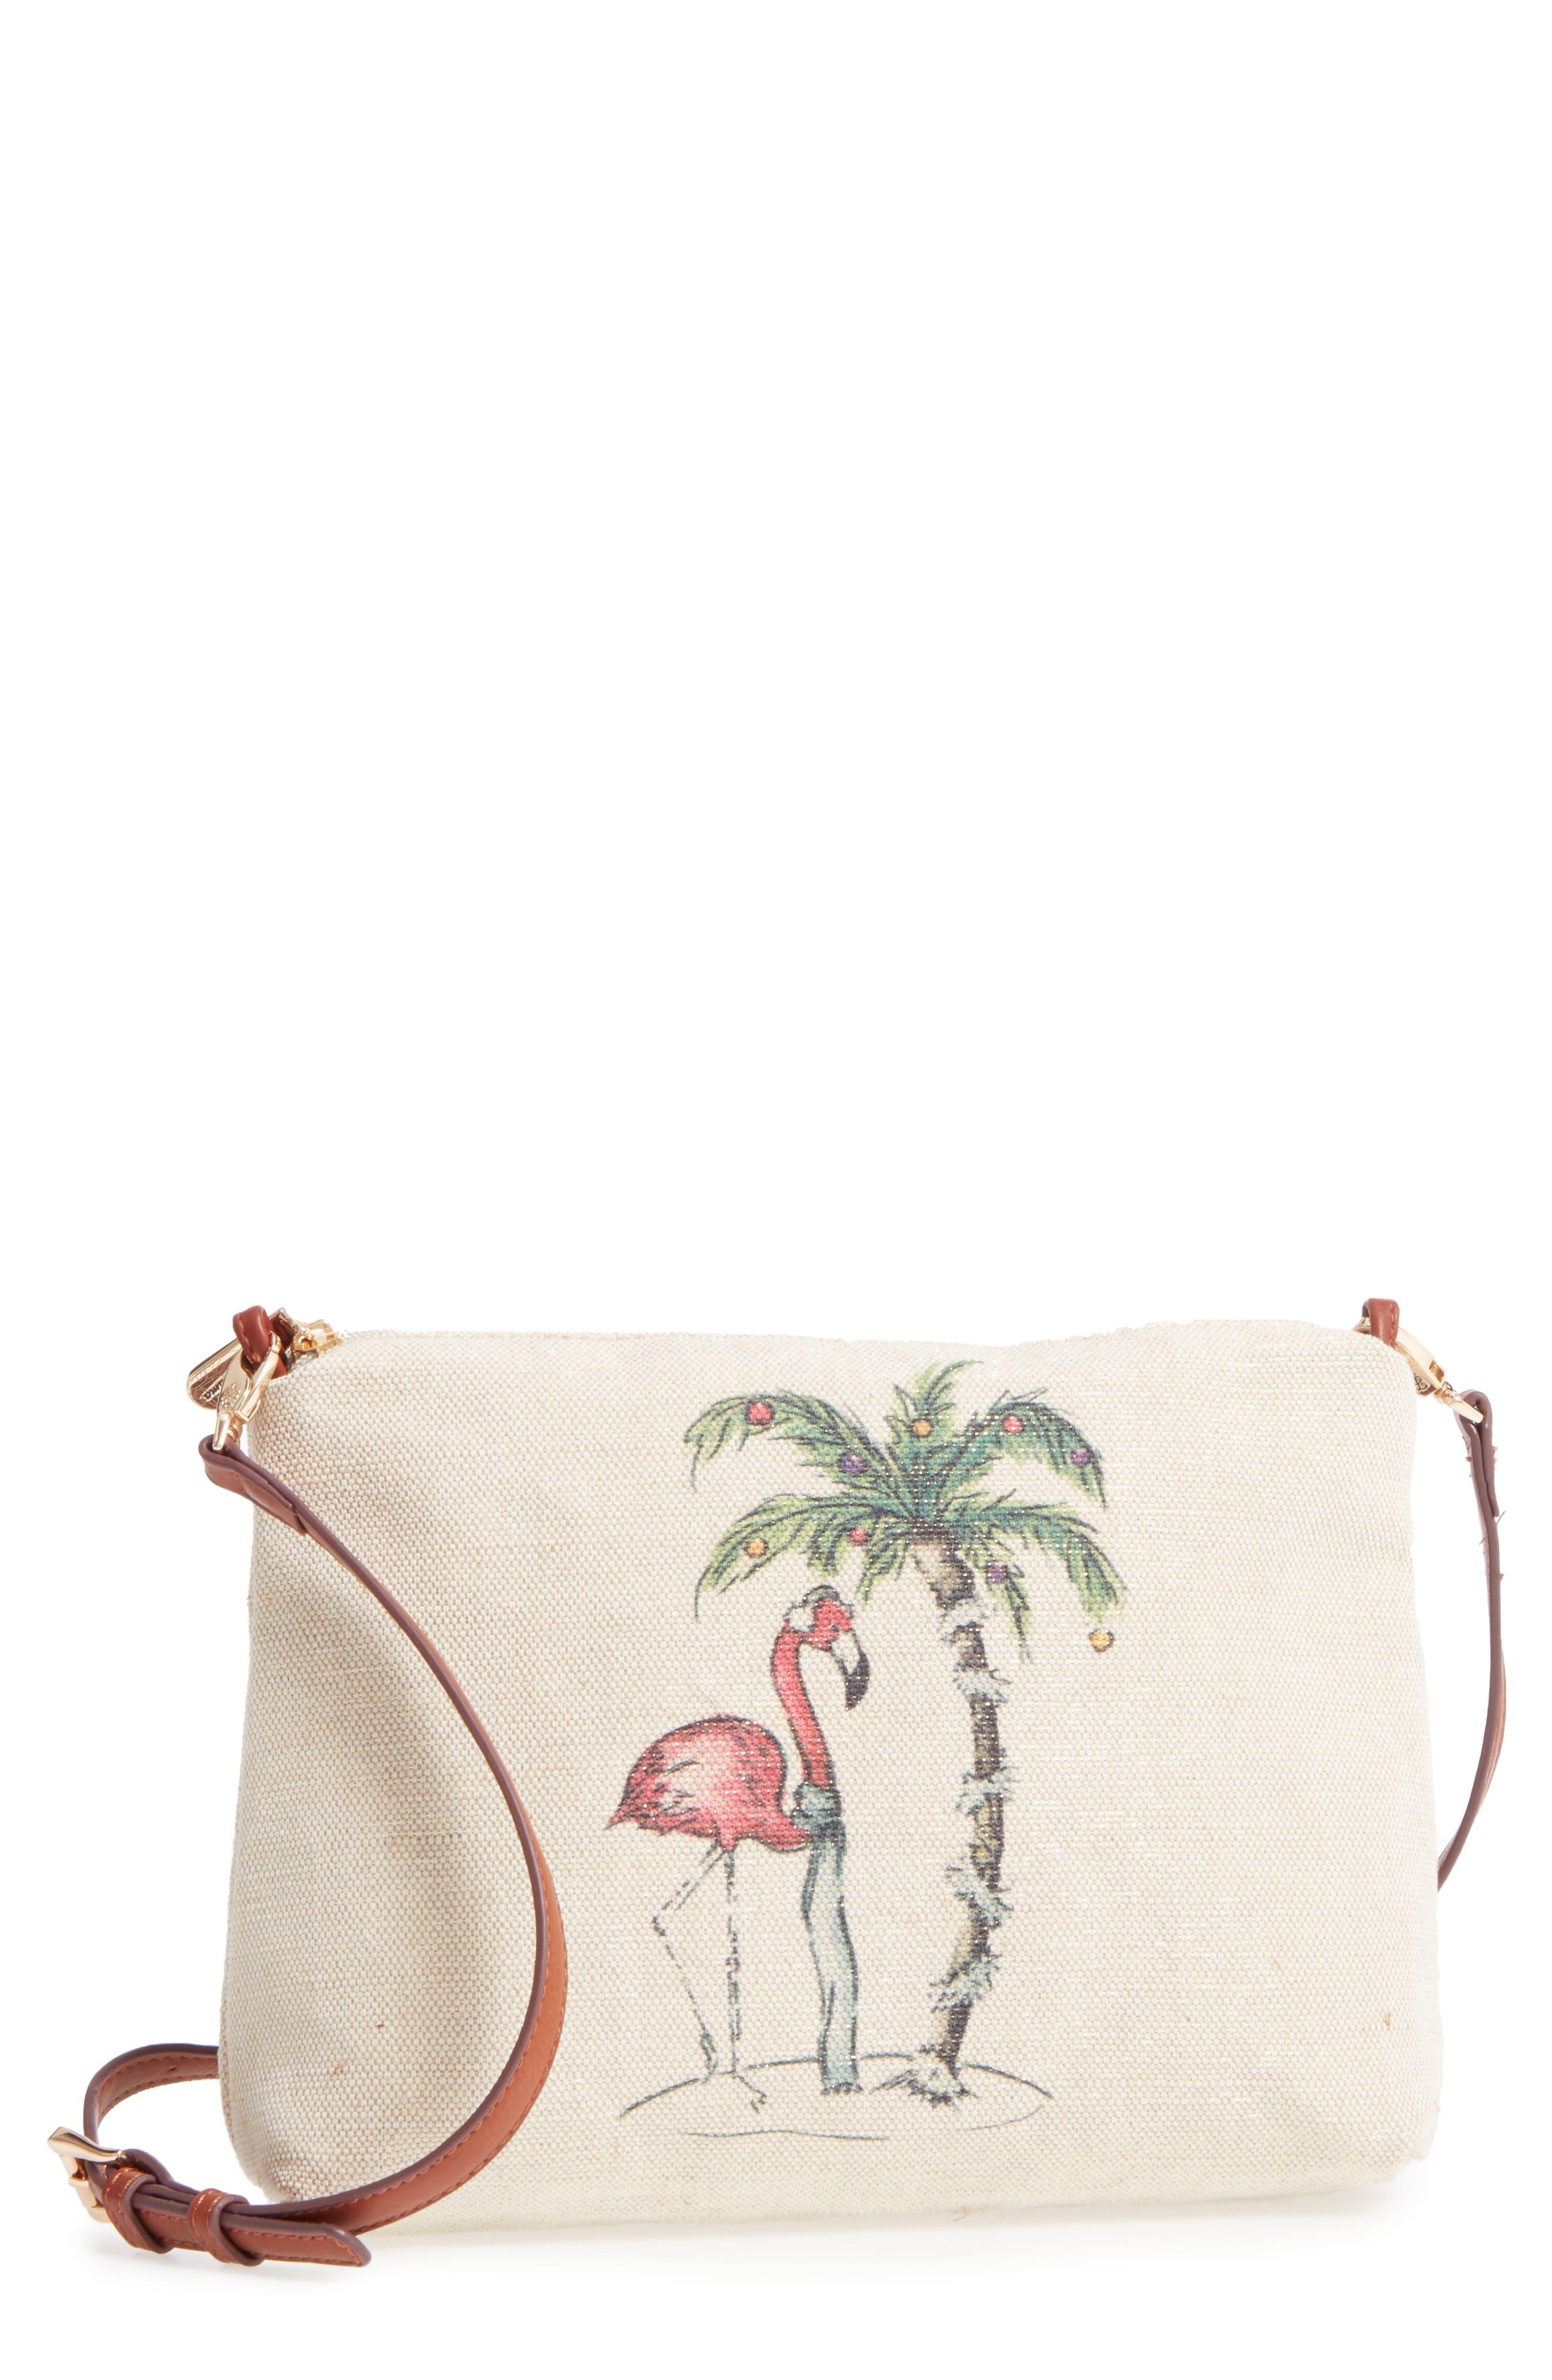 Tommy Bahama La Plancha Convertible Crossbody Bag